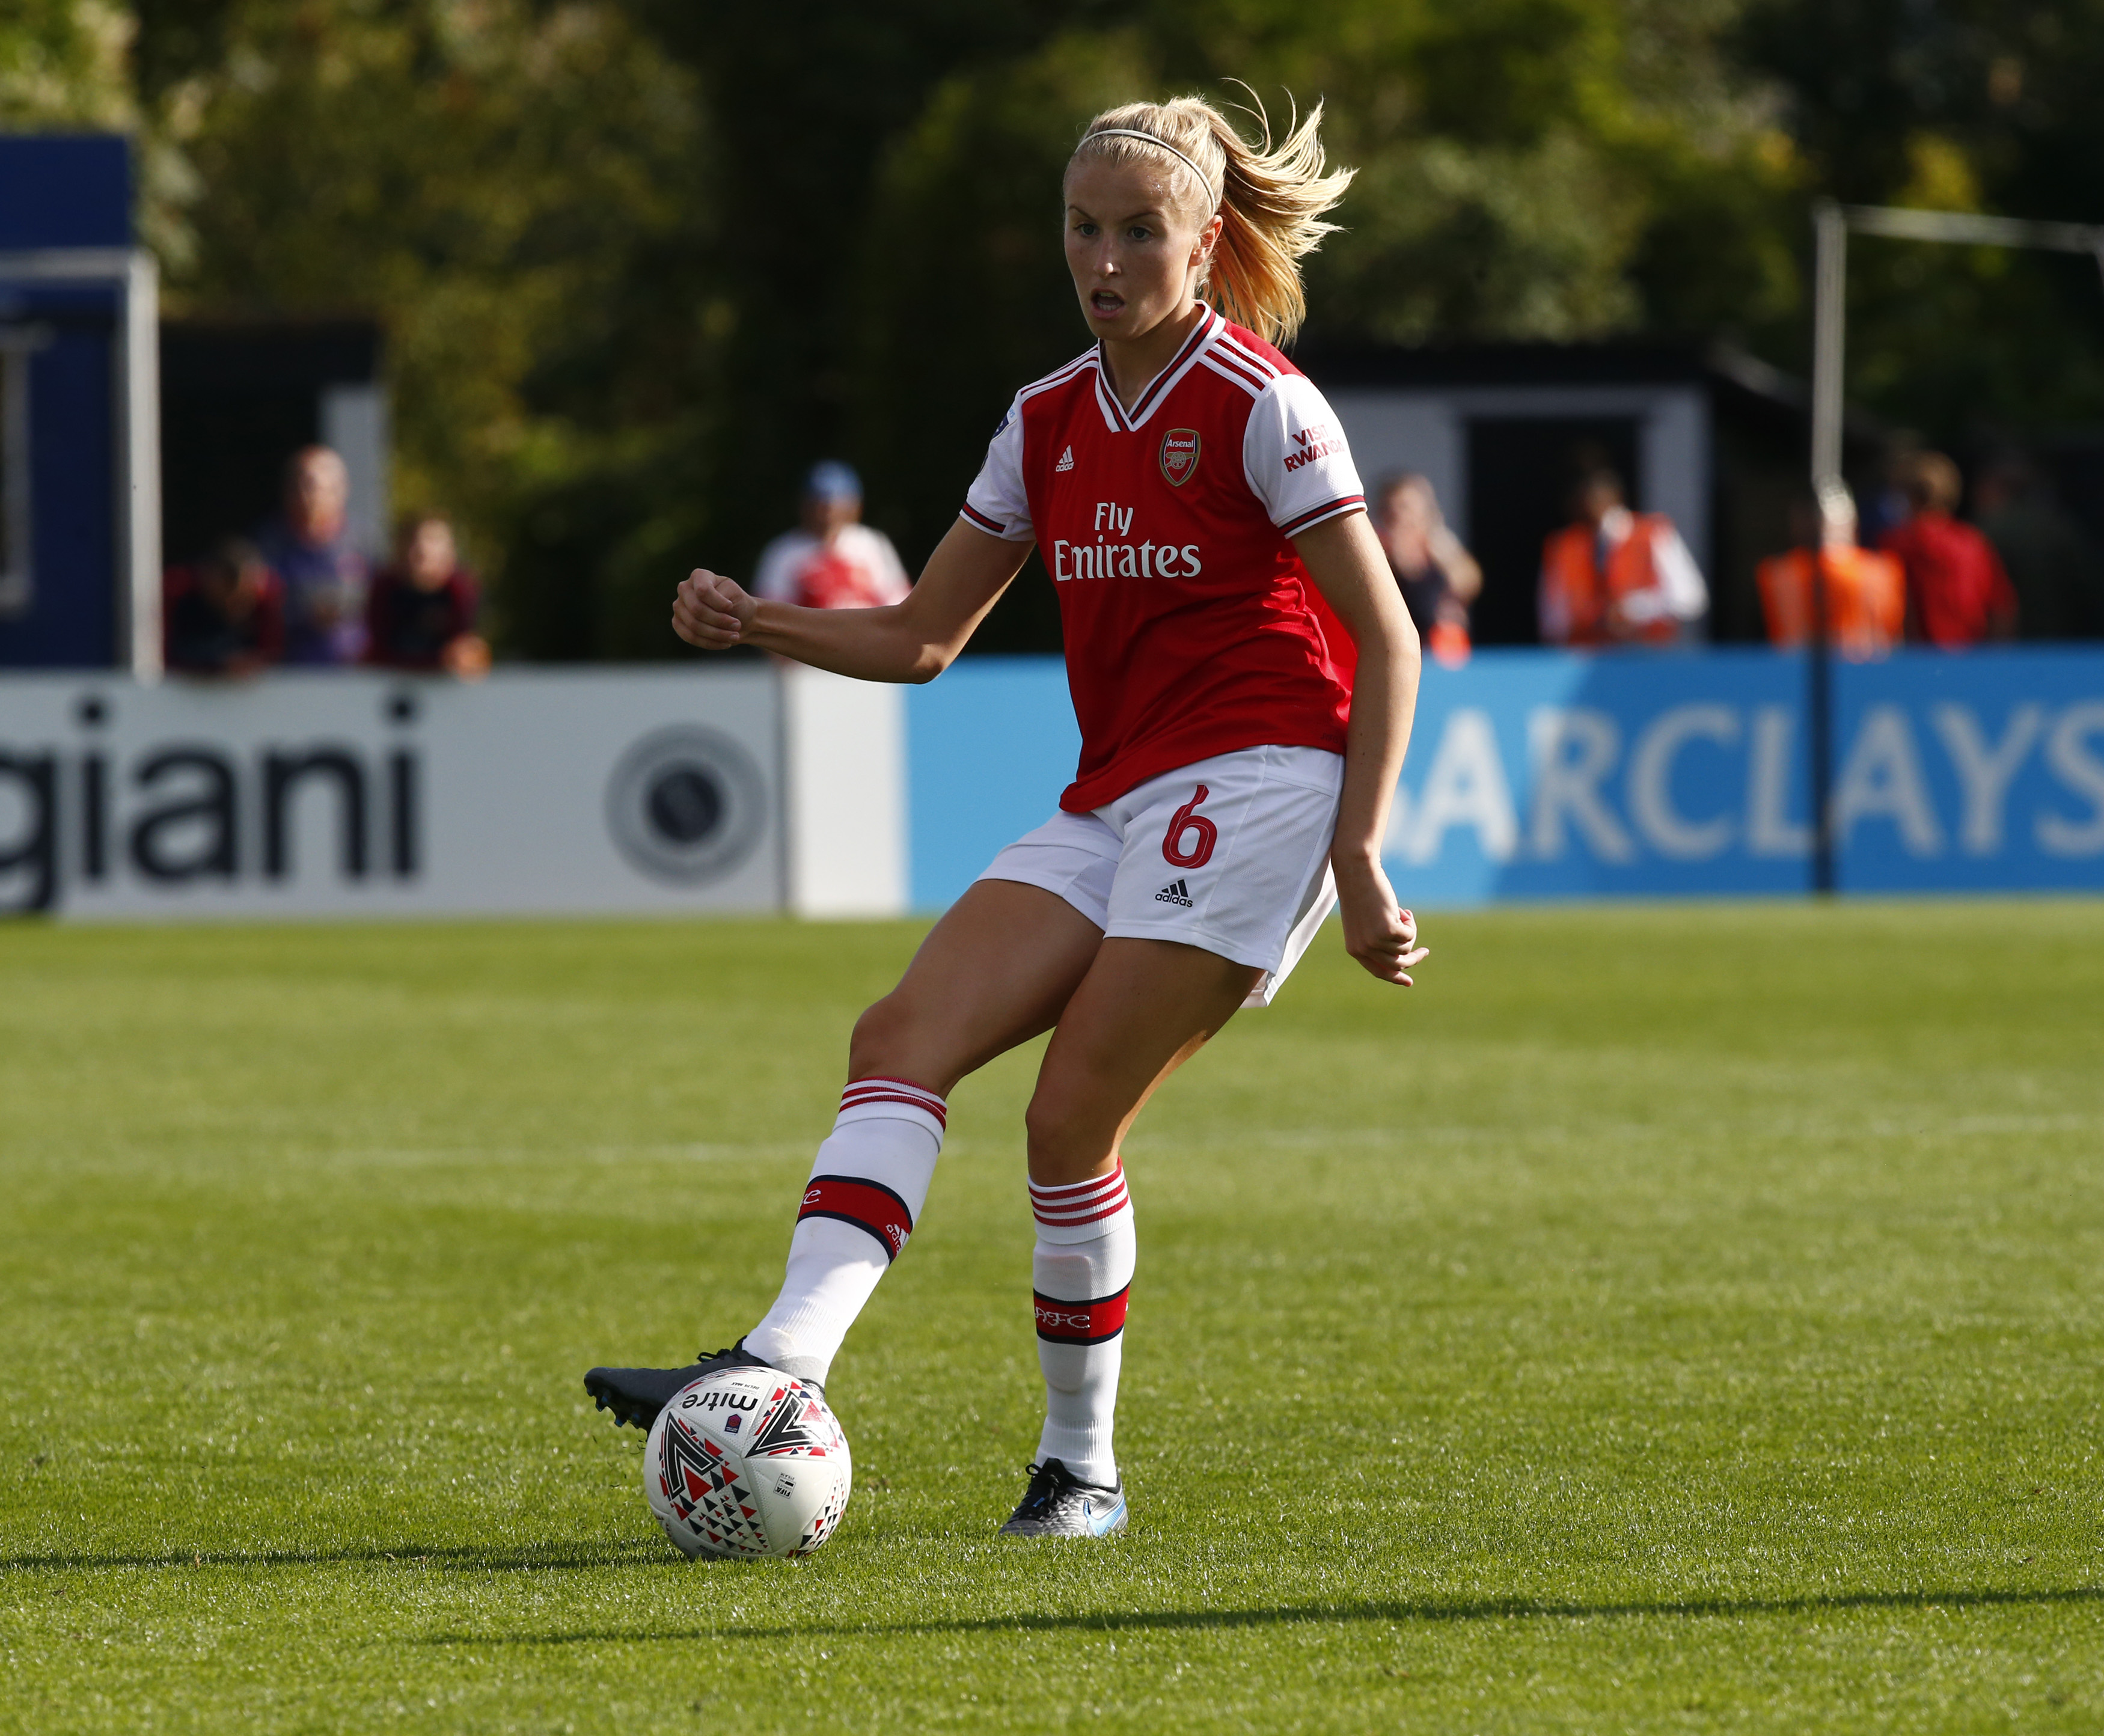 Arsenal v West Ham United - Barclays FA Women's Super League